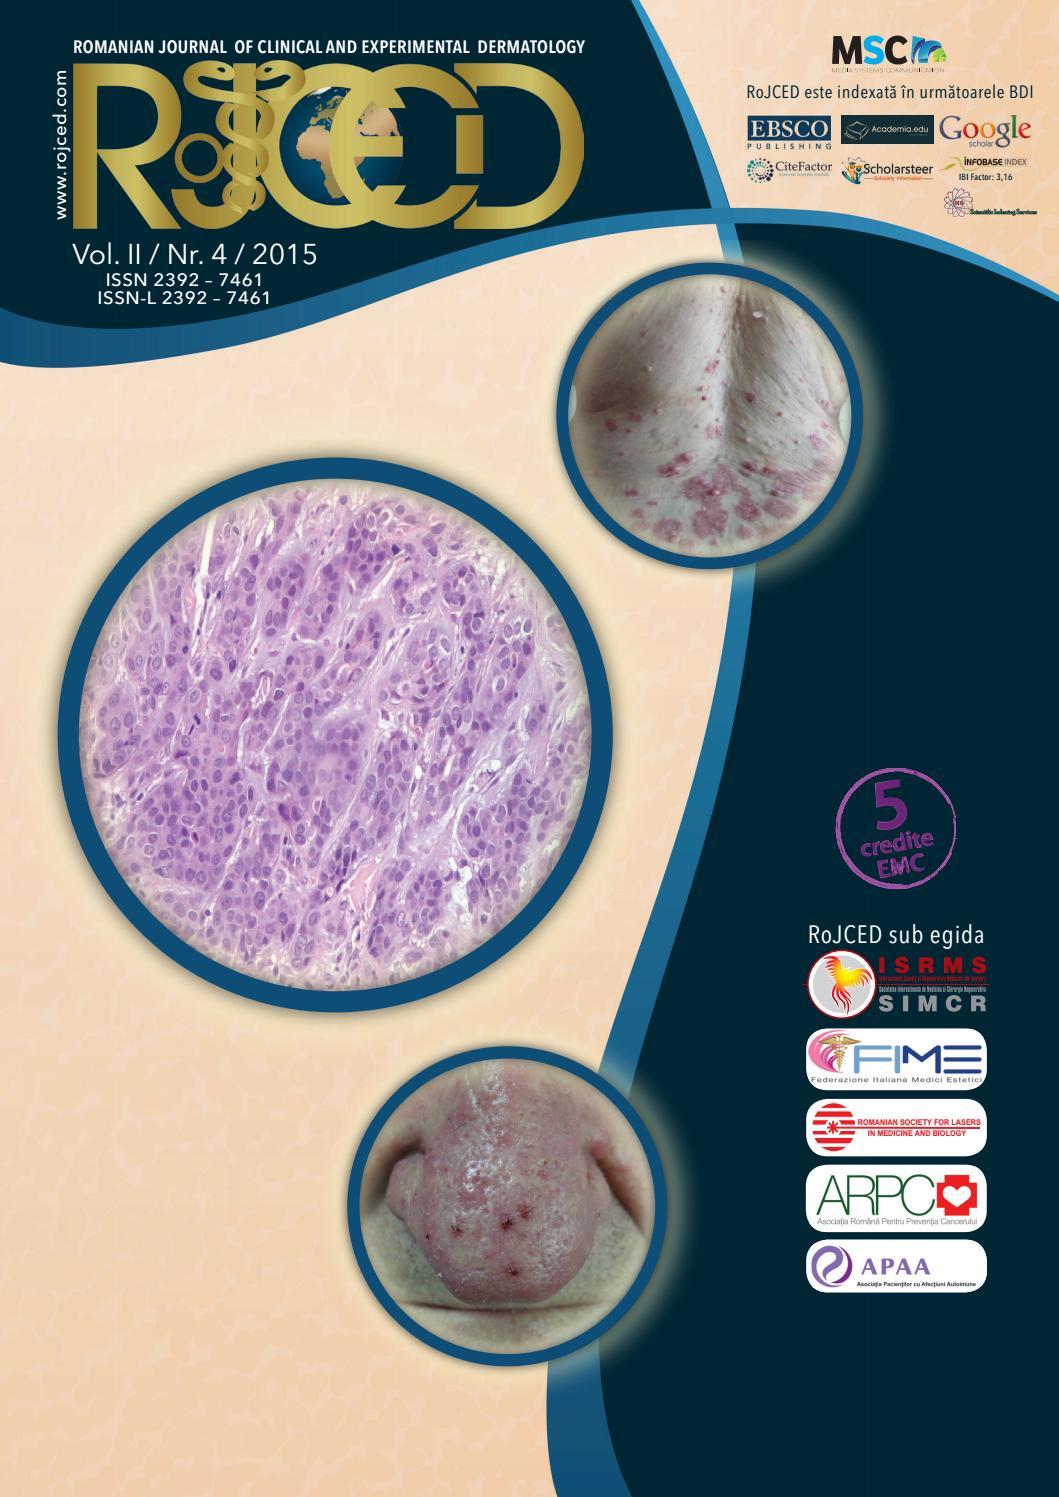 papillomavirus kutya îndepărtarea verucilor genitale pe față